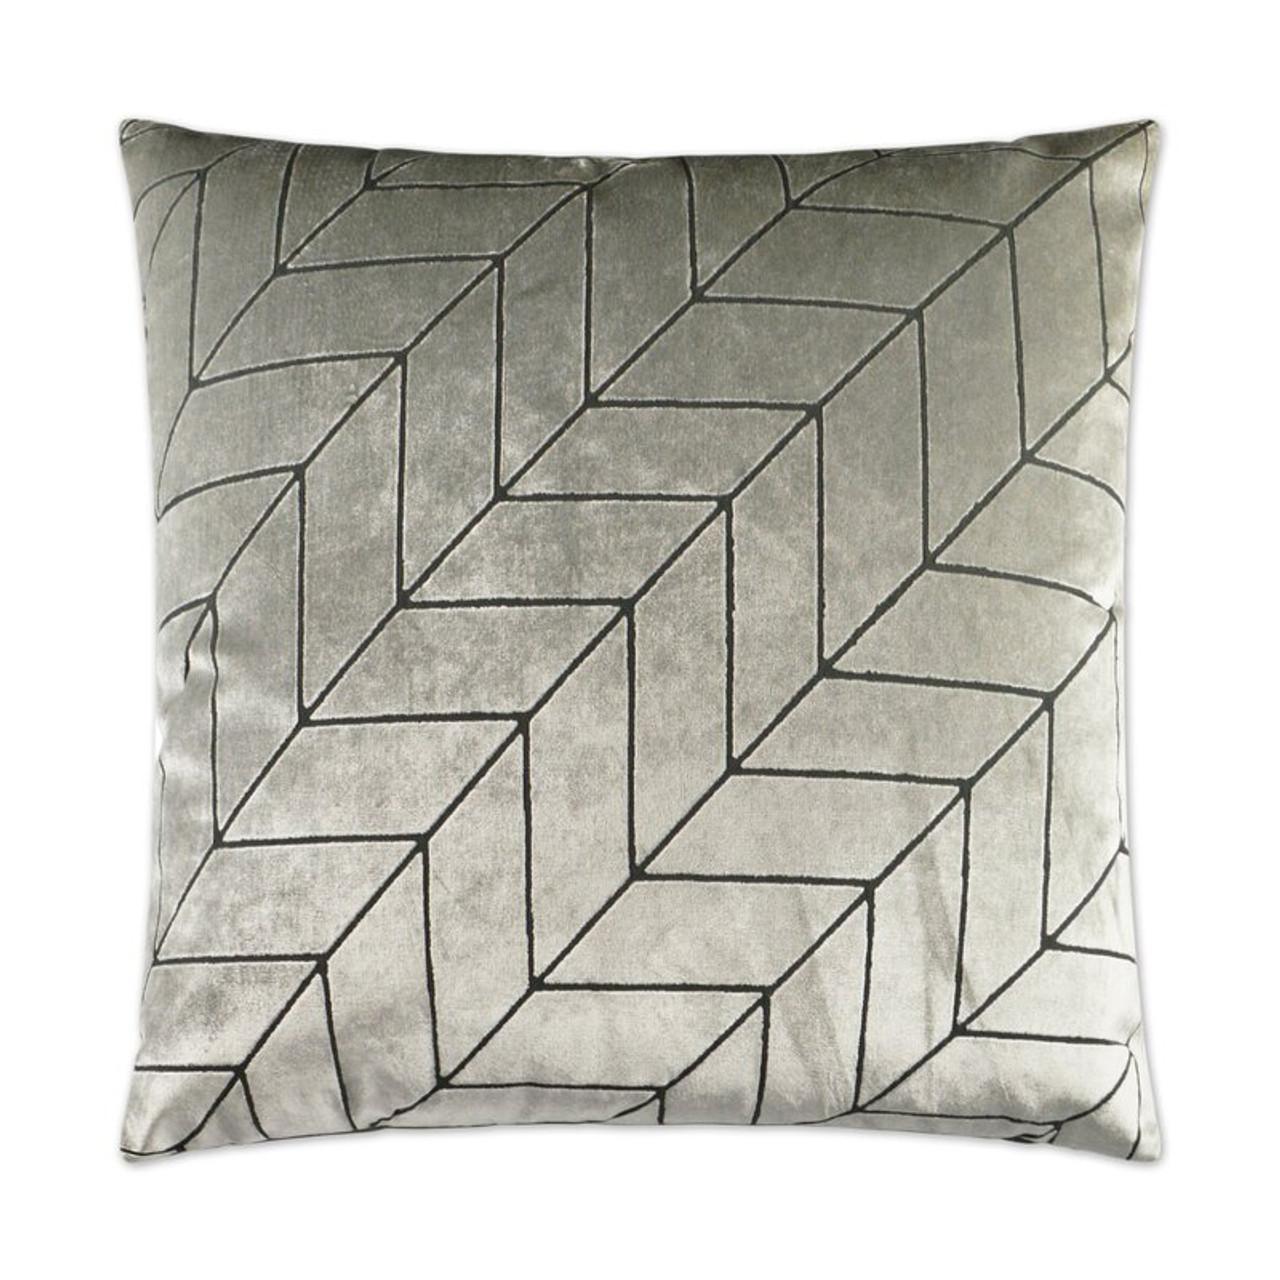 Villa Geometric Throw Pillow - Silver